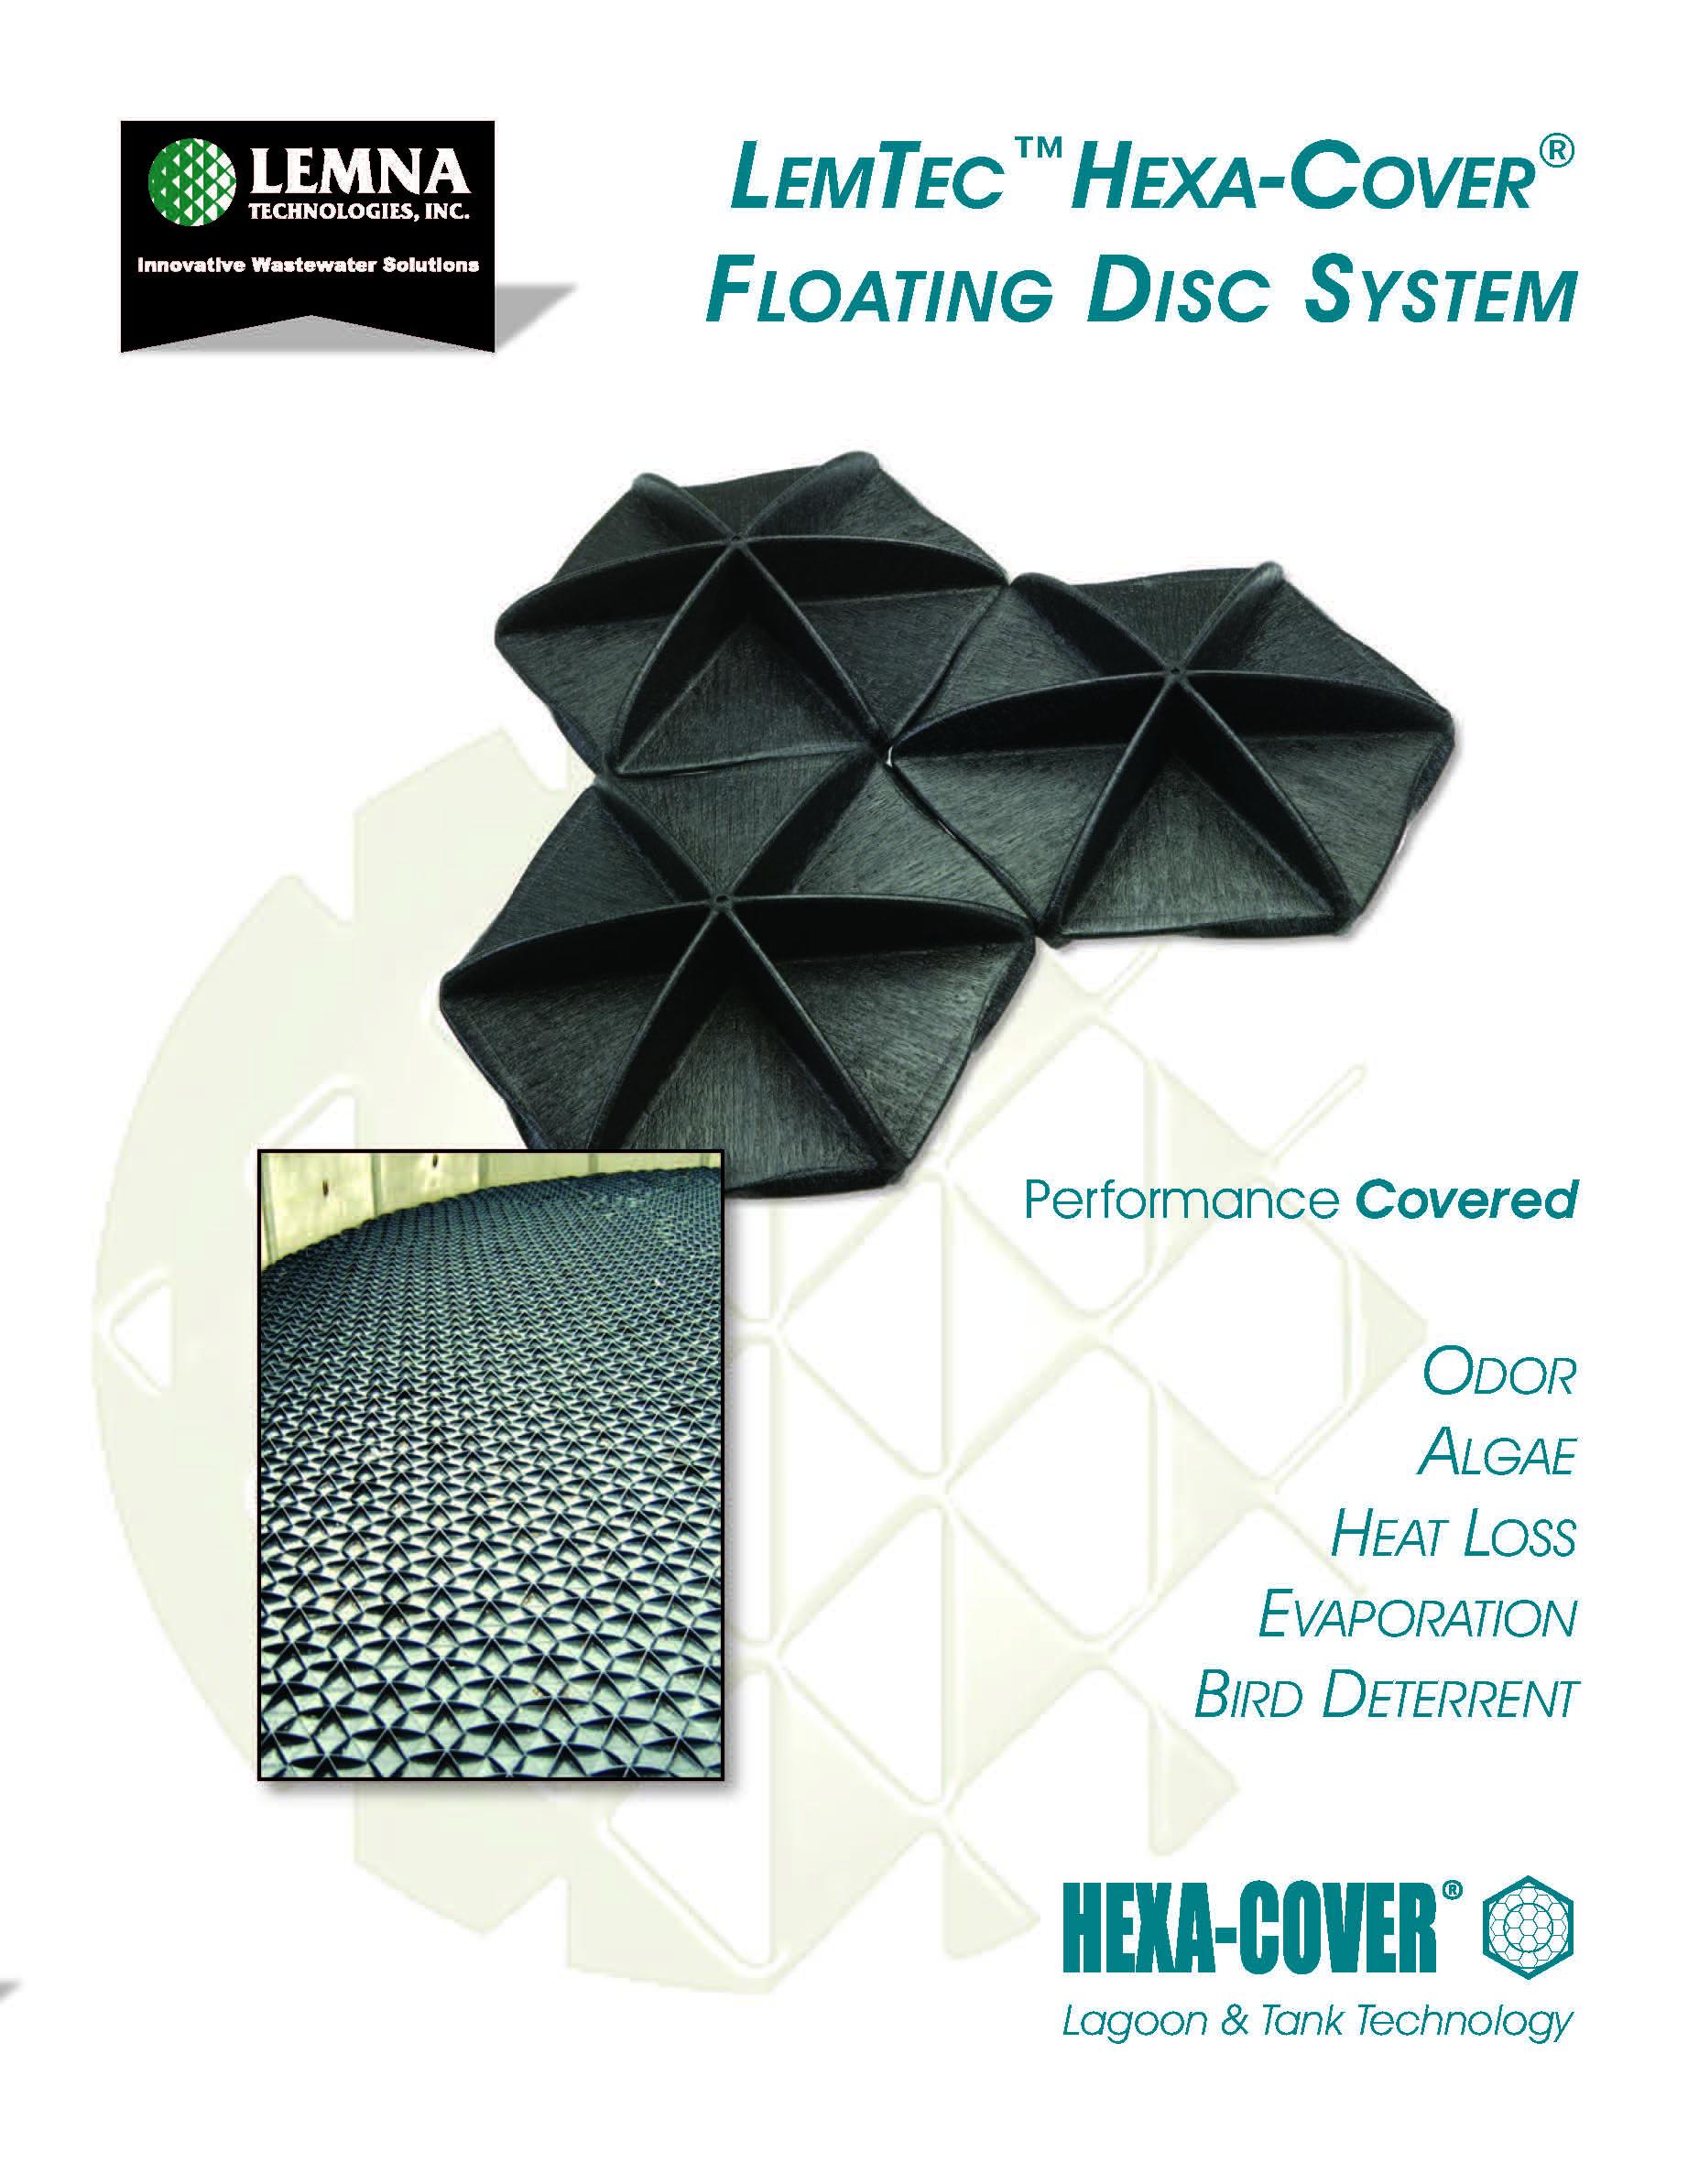 LemTec™ Hexa-Cover Floating Disc System